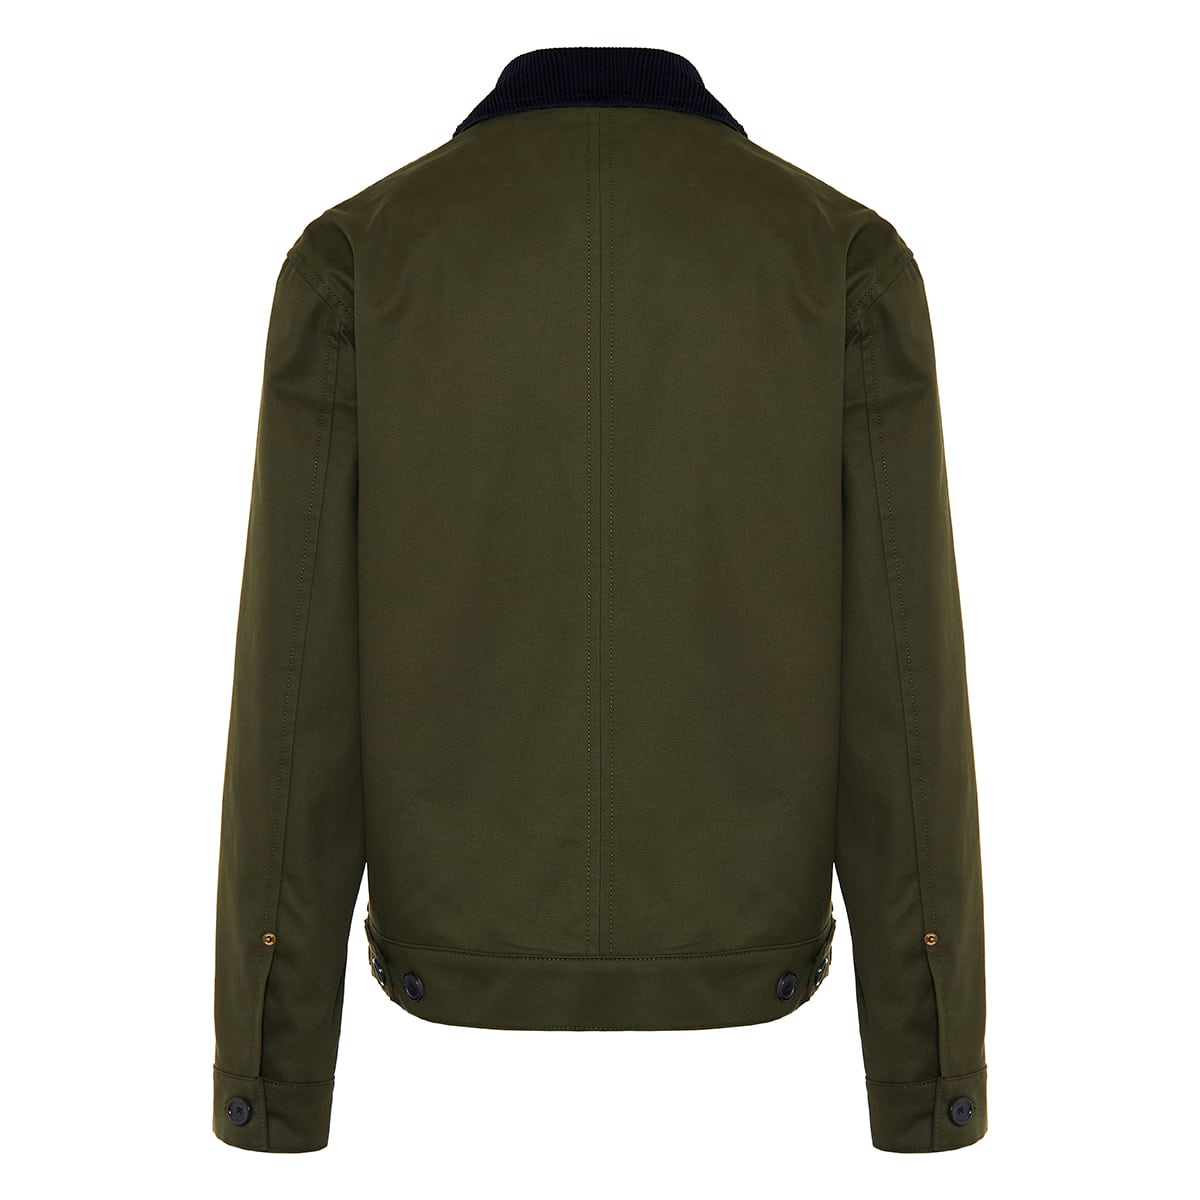 Workwear cotton jacket